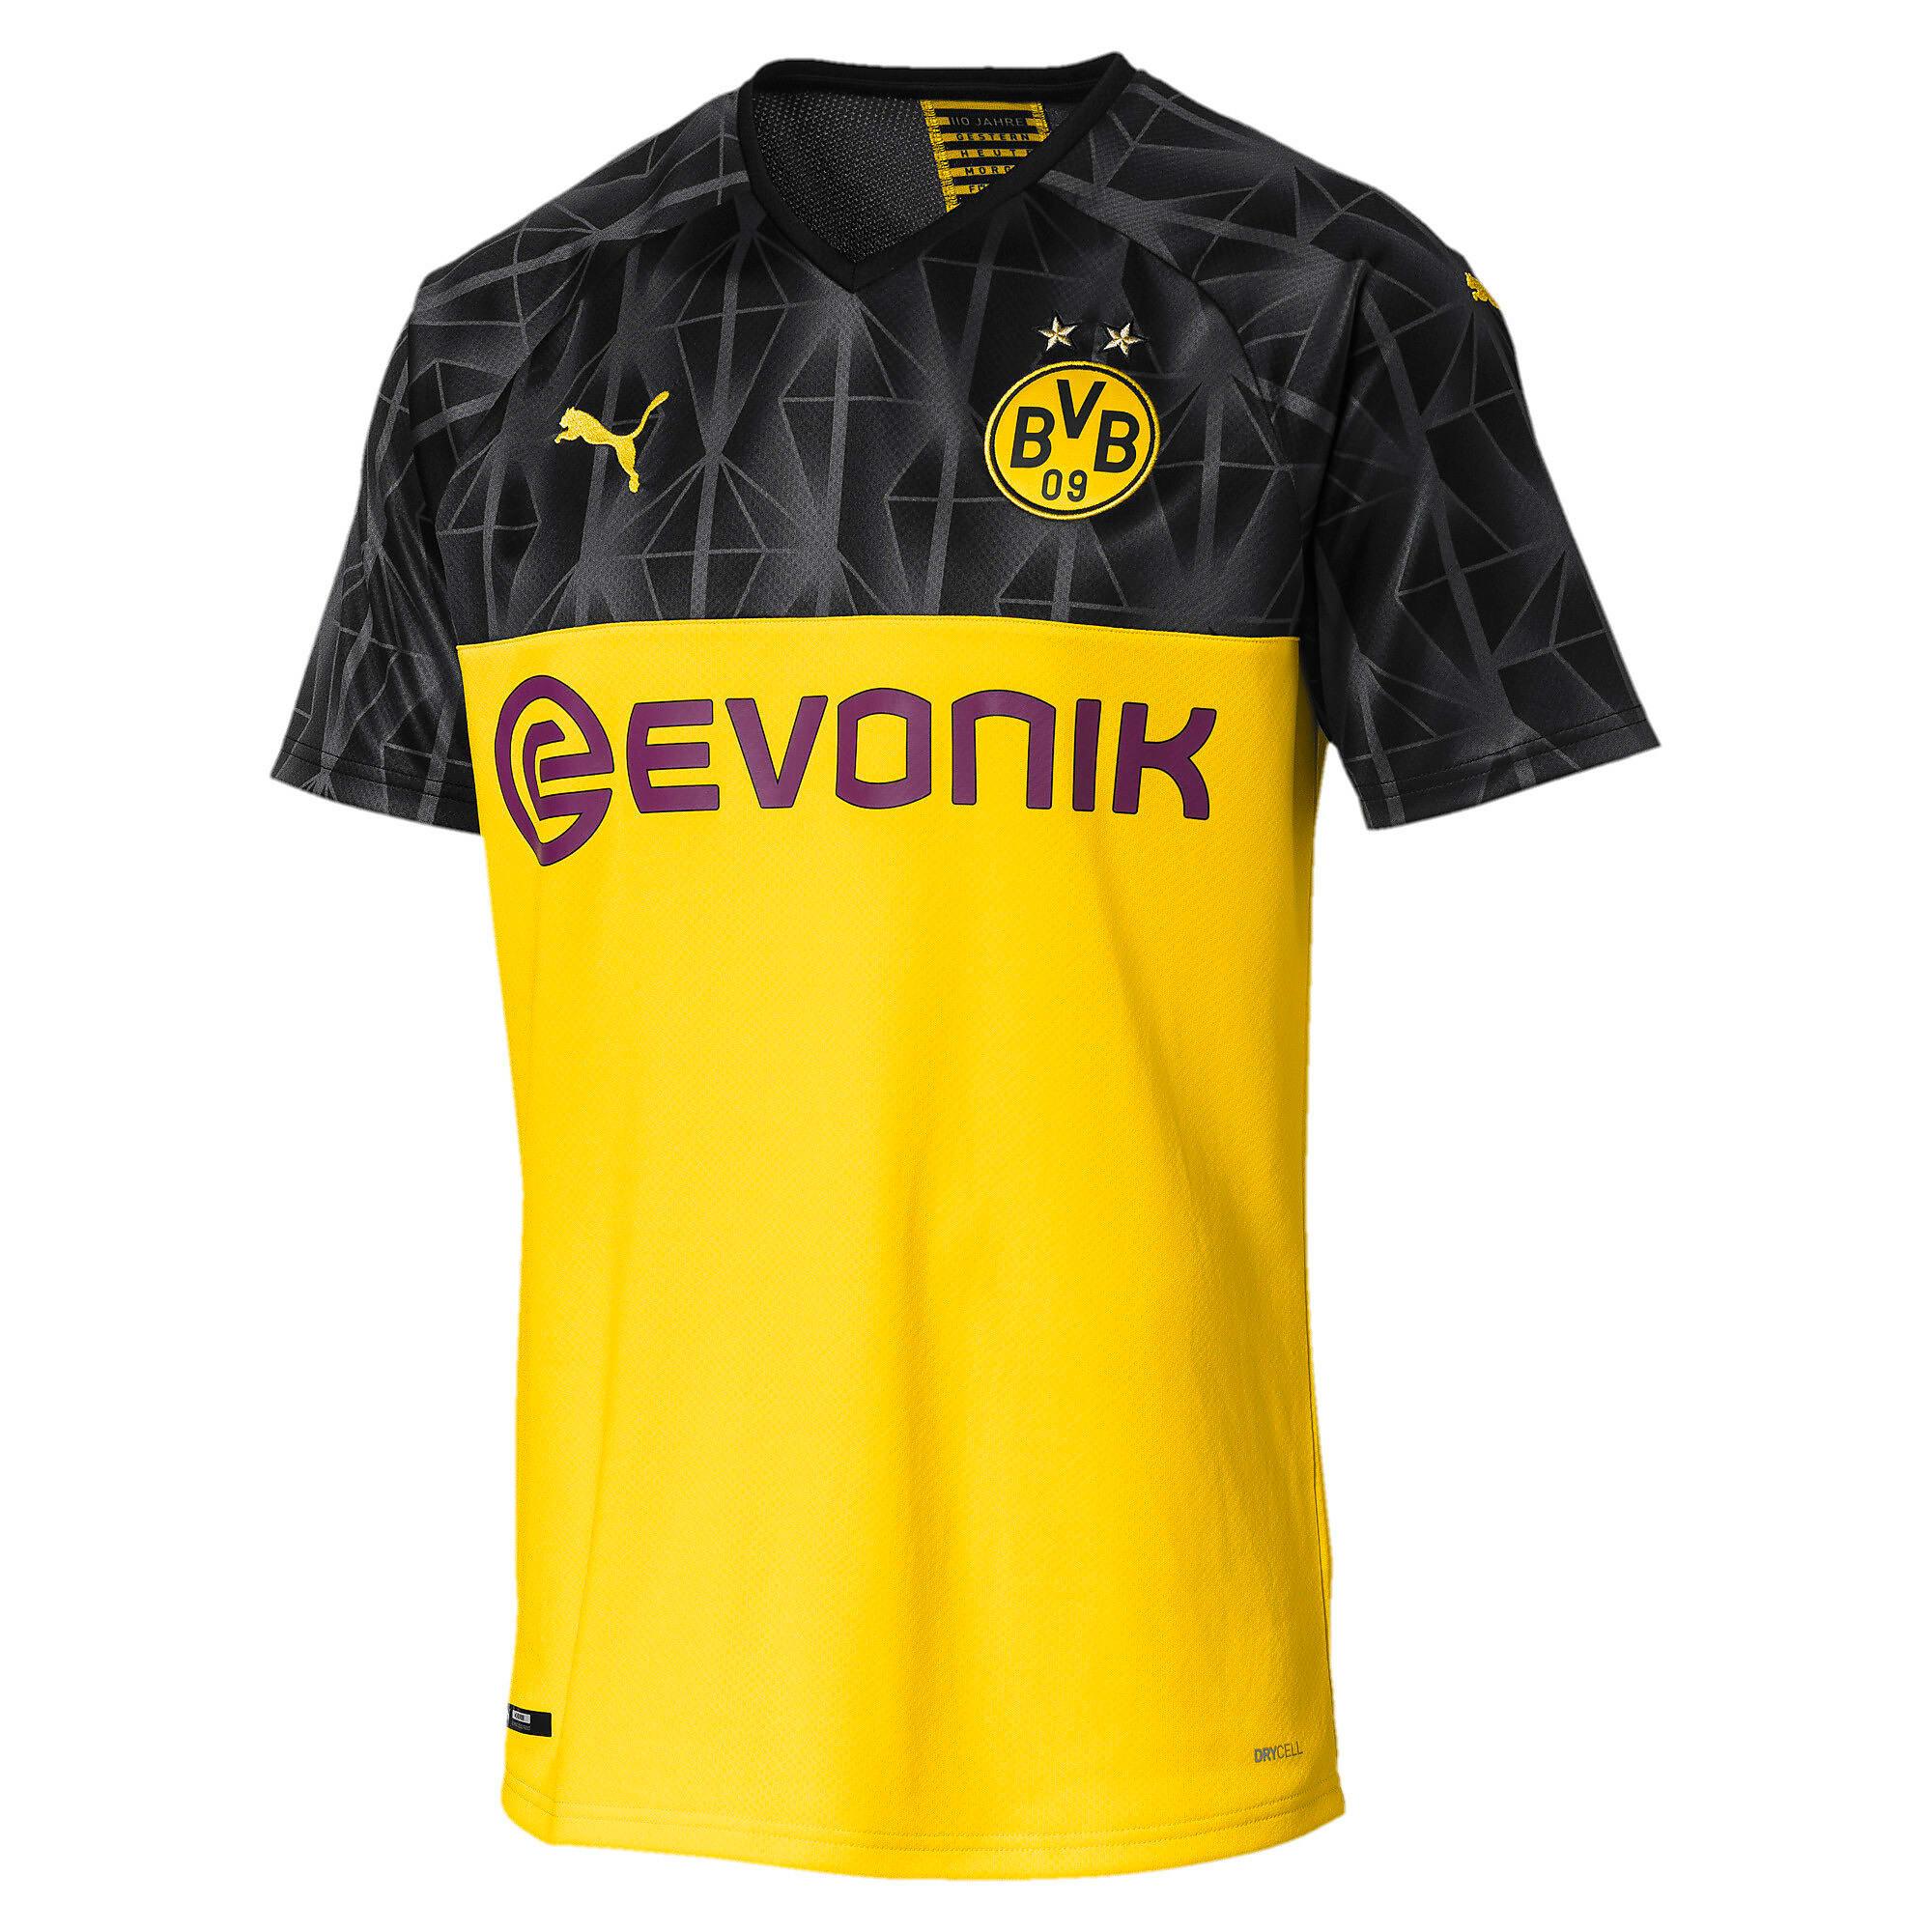 Thumbnail 1 of ドルトムント BVB SS カップ レプリカシャツ (半袖), Cyber Yellow-Puma Black, medium-JPN